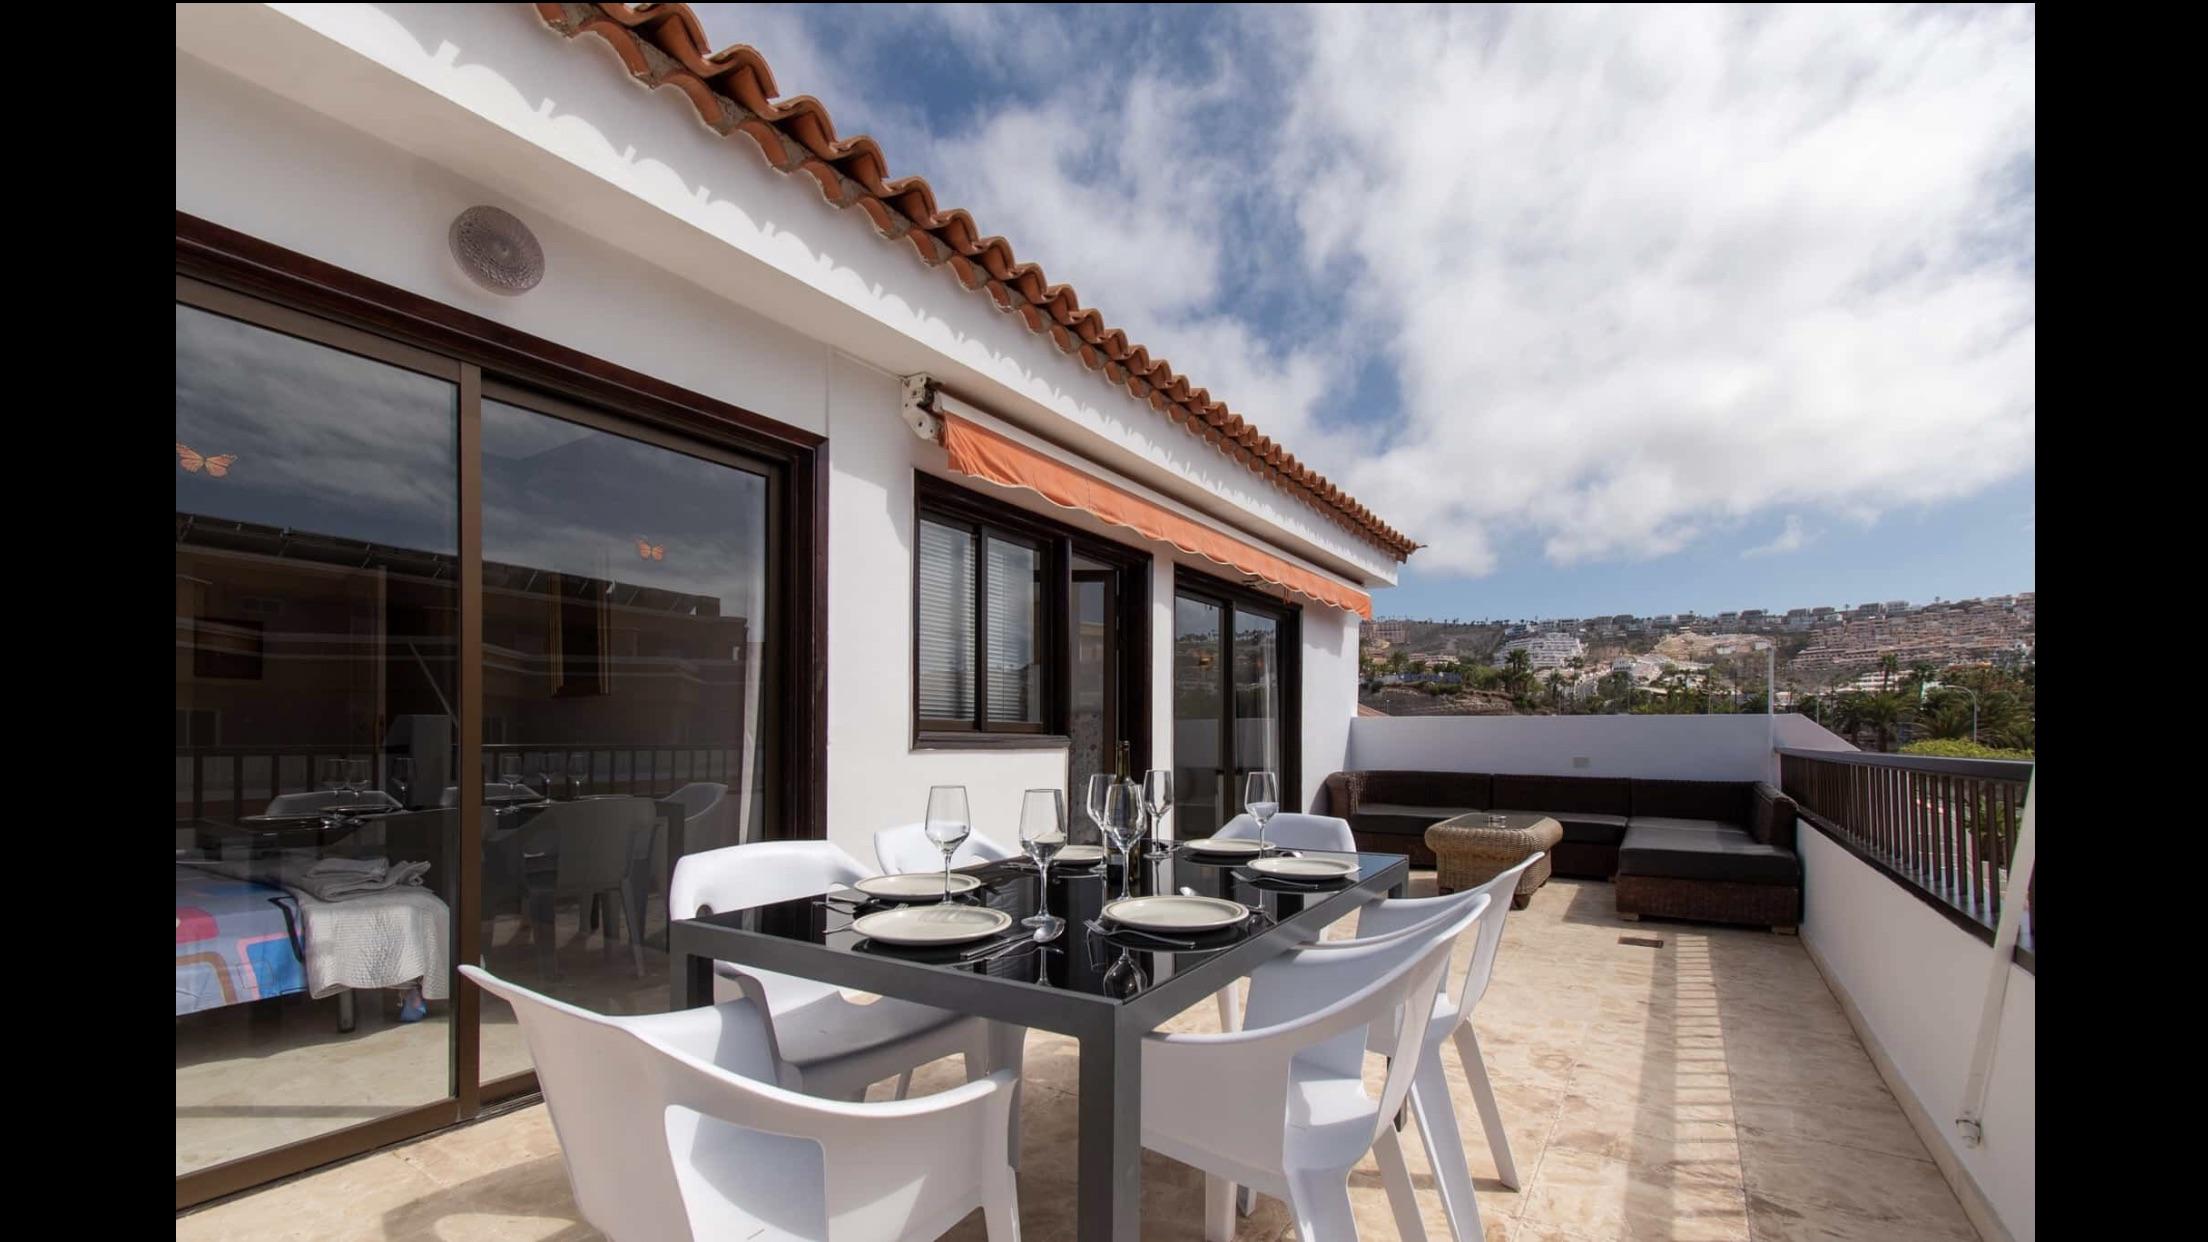 Letting Property Home O050210P, San Eugenio